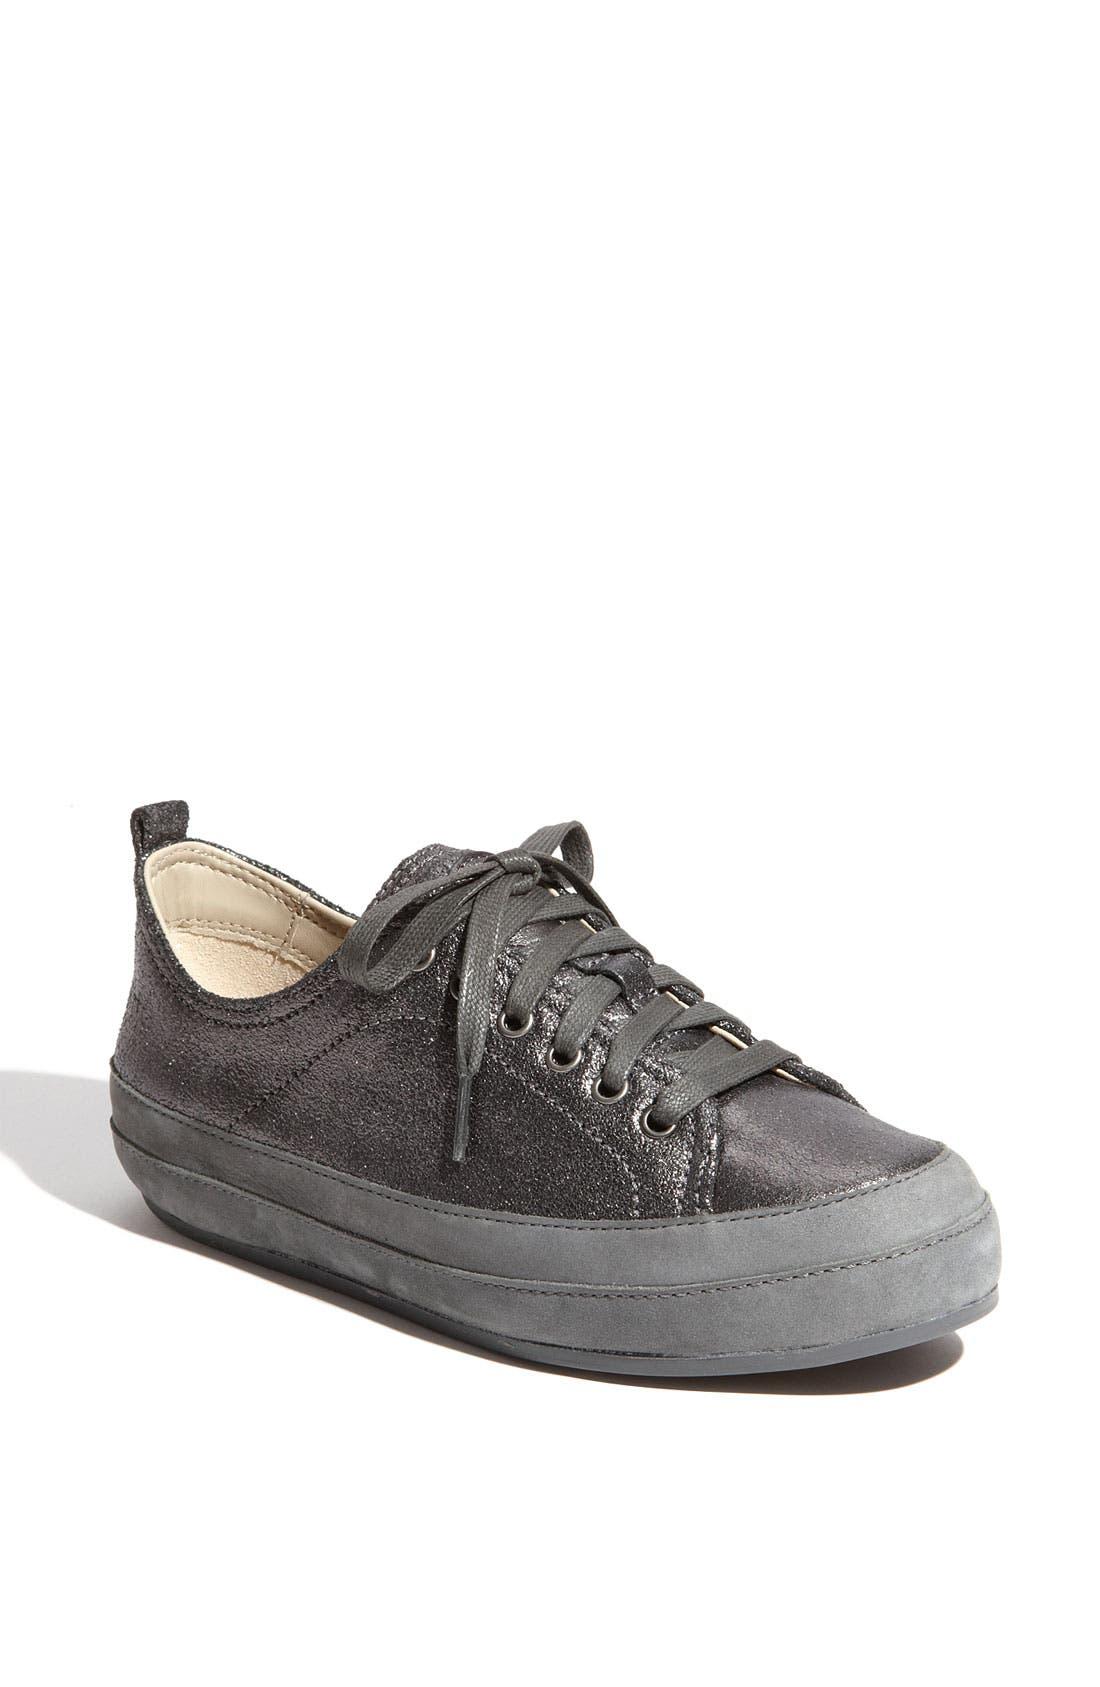 'Supertone<sup>™</sup> Luxe' Sneaker,                             Main thumbnail 1, color,                             026